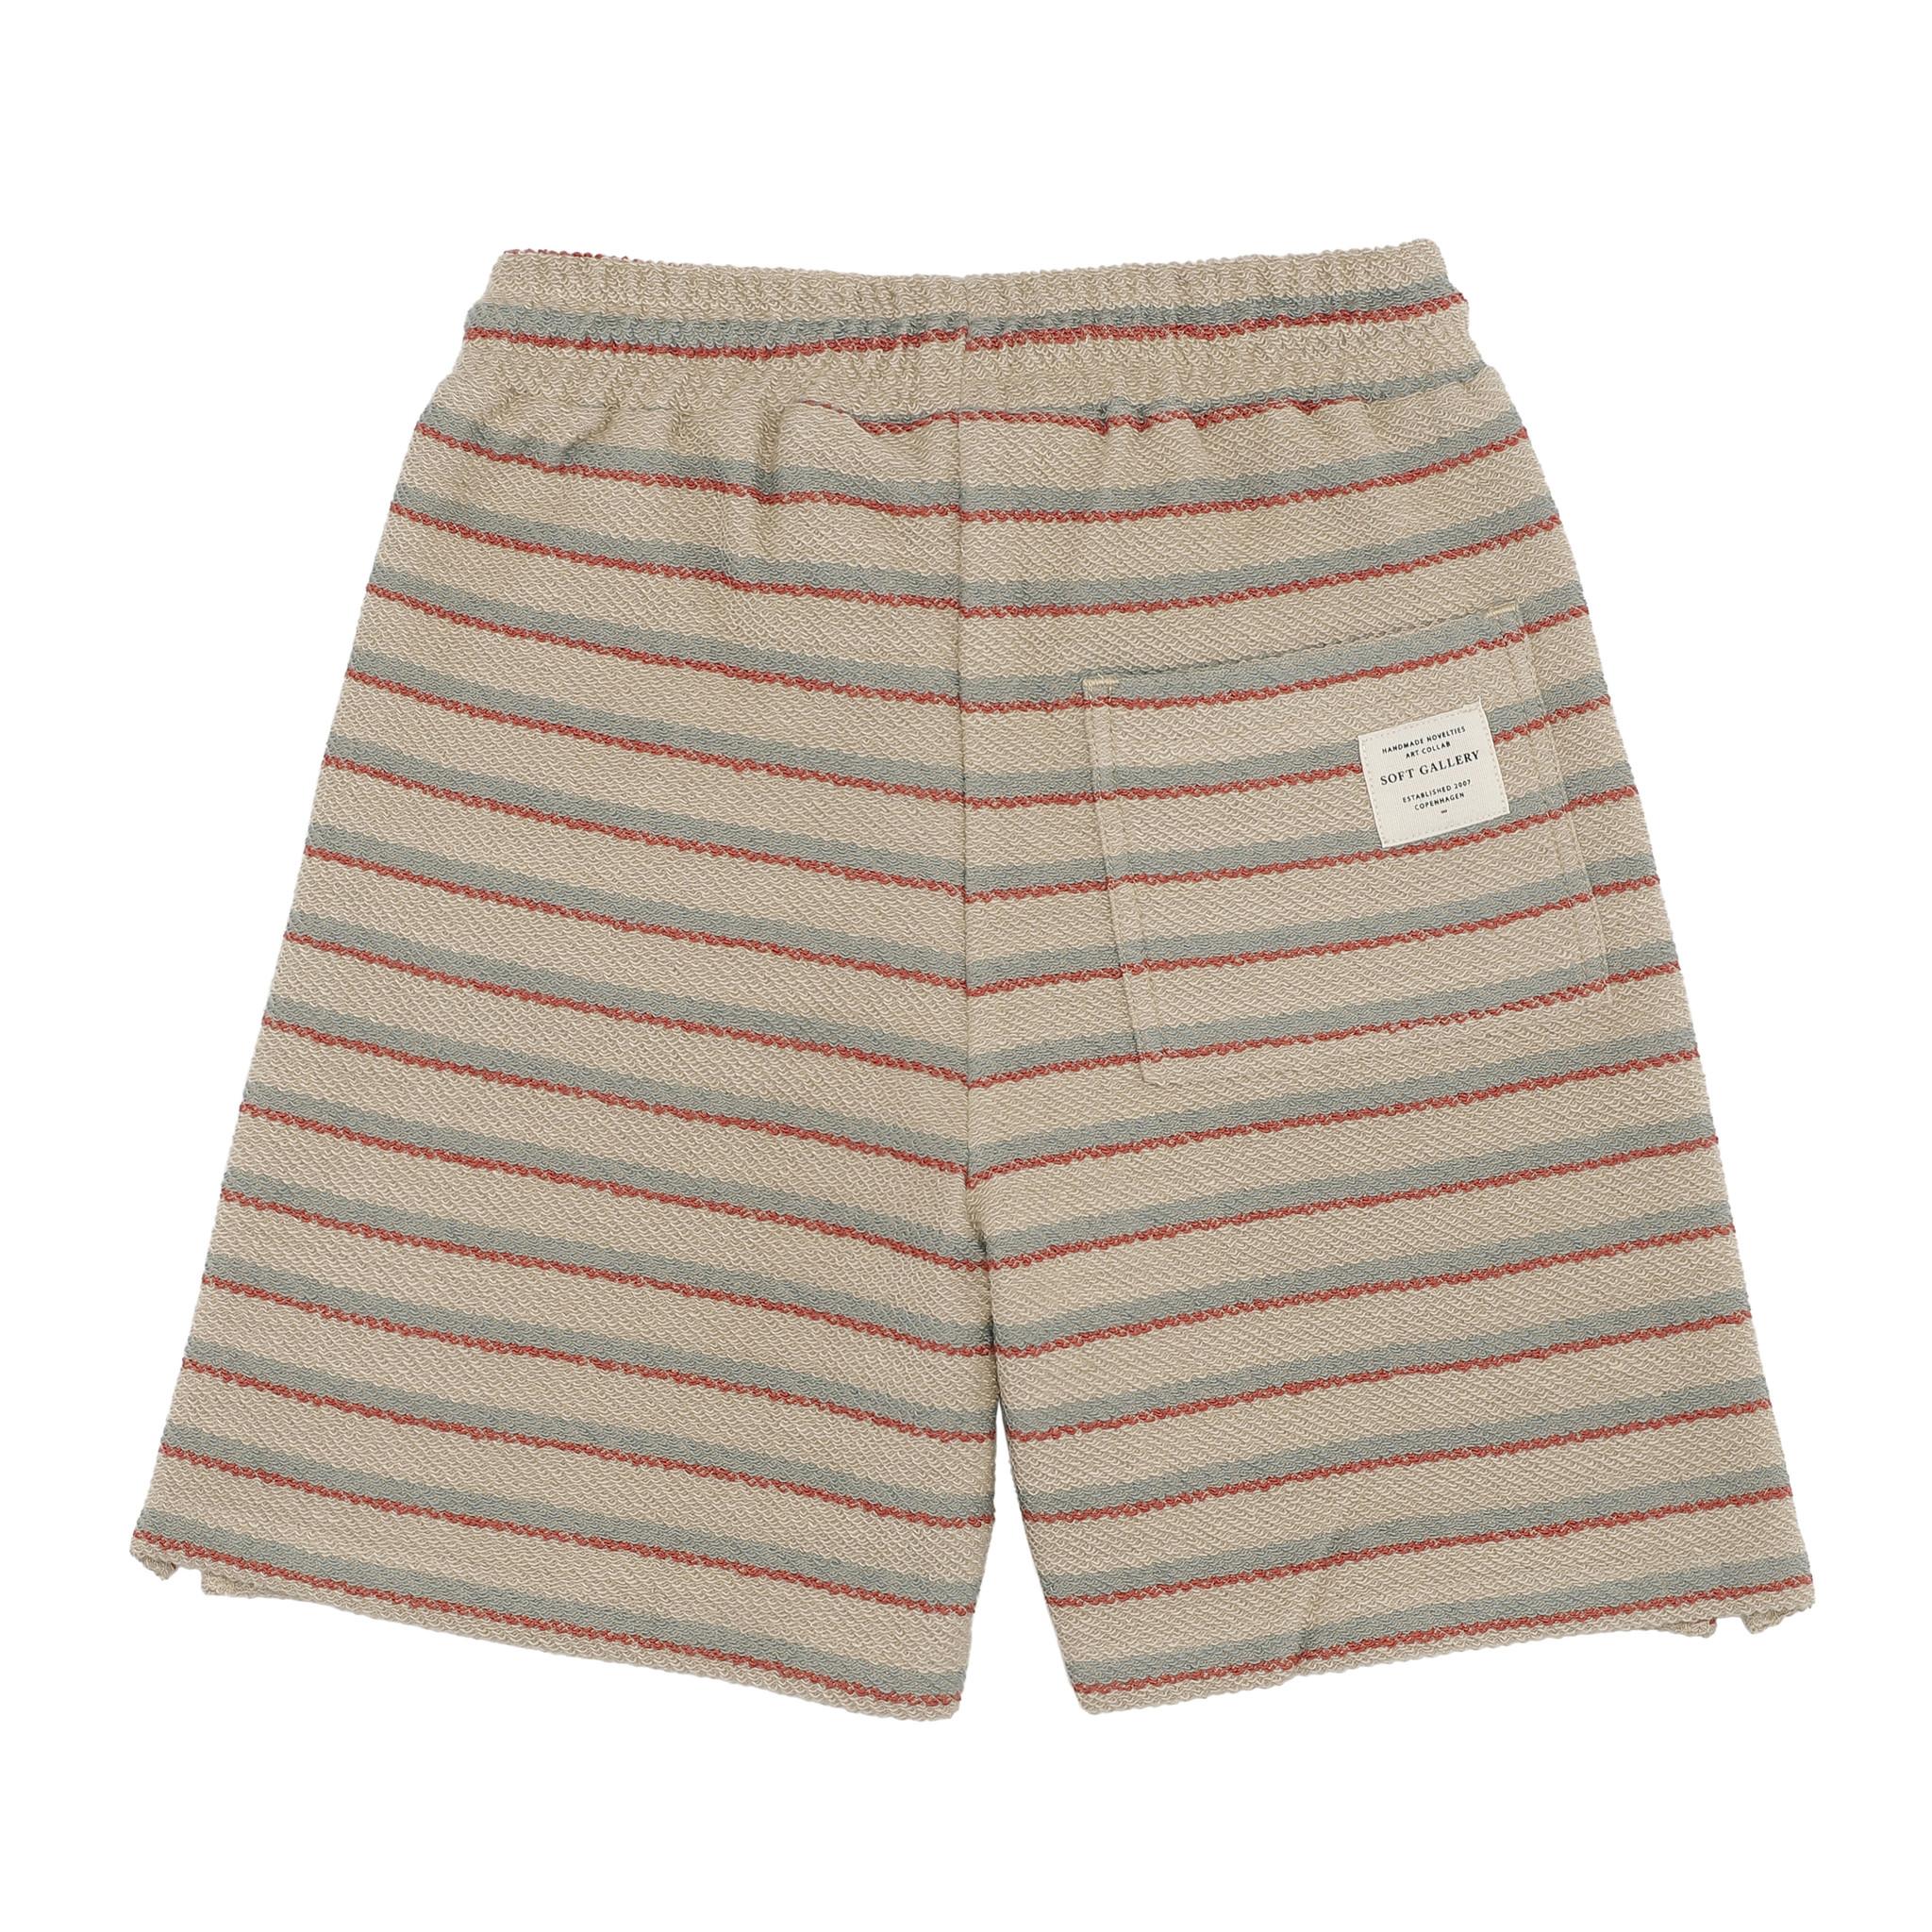 Alisdair shorts - Mojave Desert / AOP wavy-3